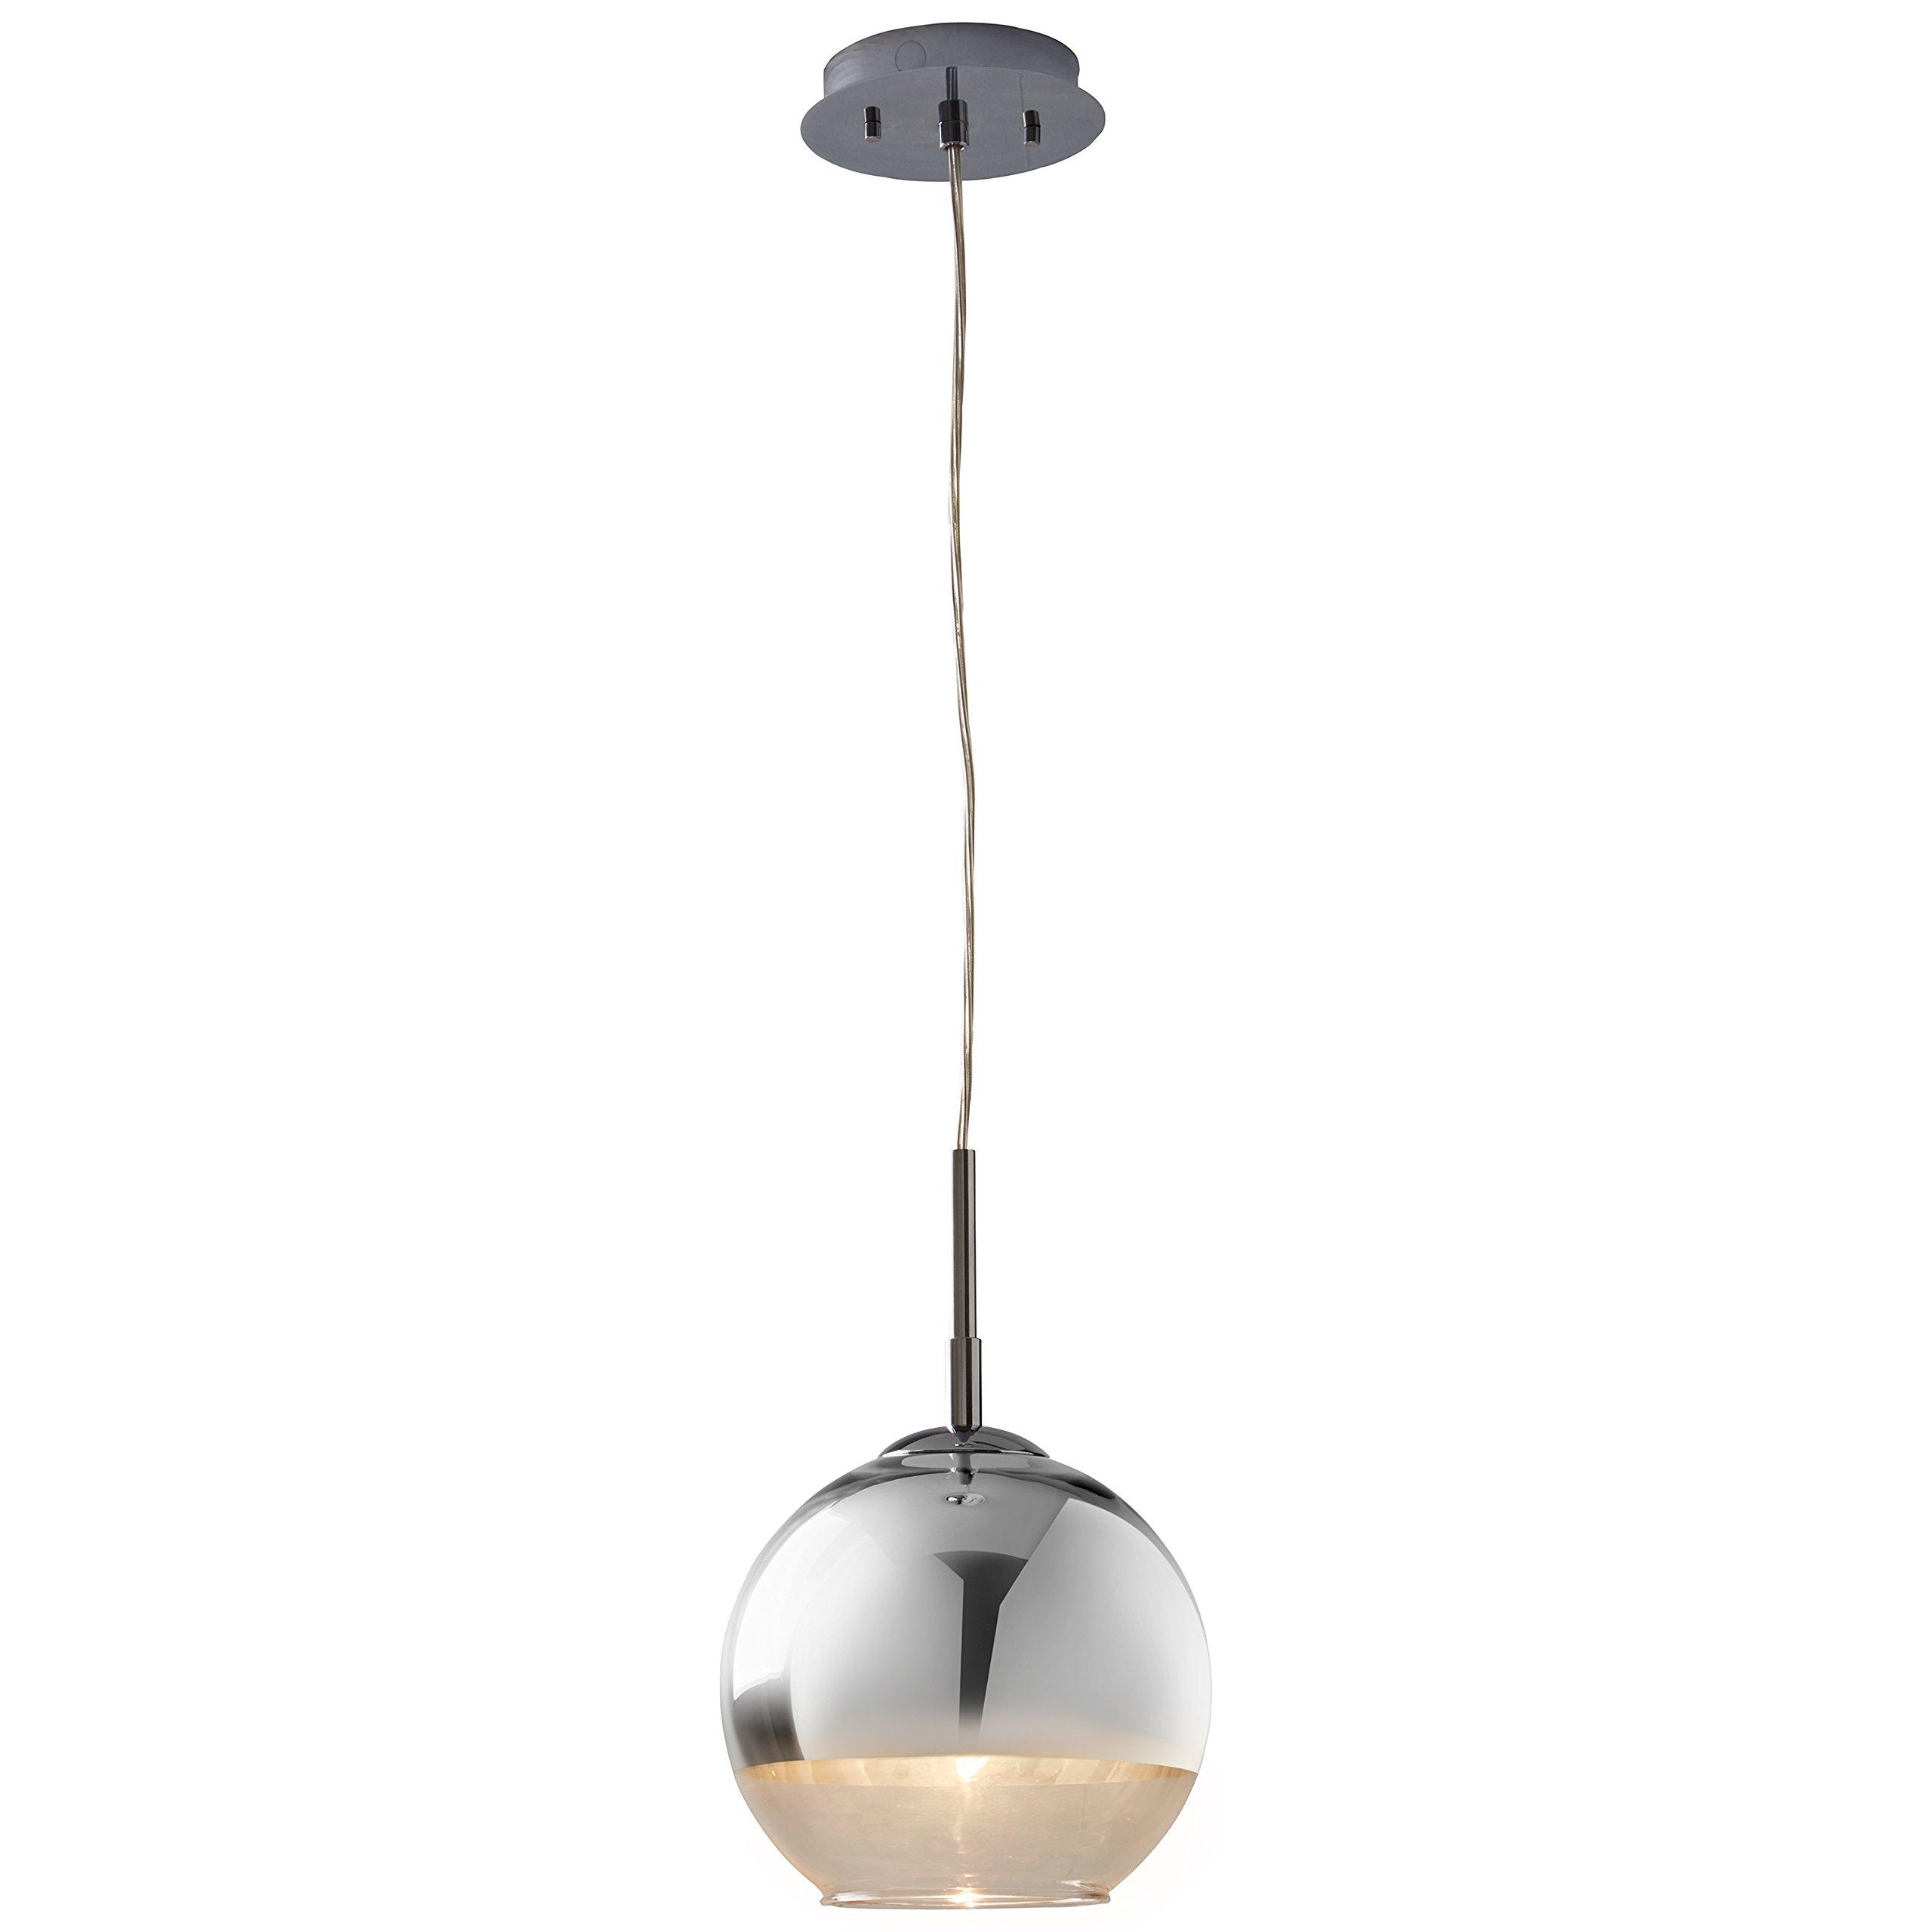 Rivet Hugh Pendant With Bulb, 13'' to 61''H, Chrome and Glass